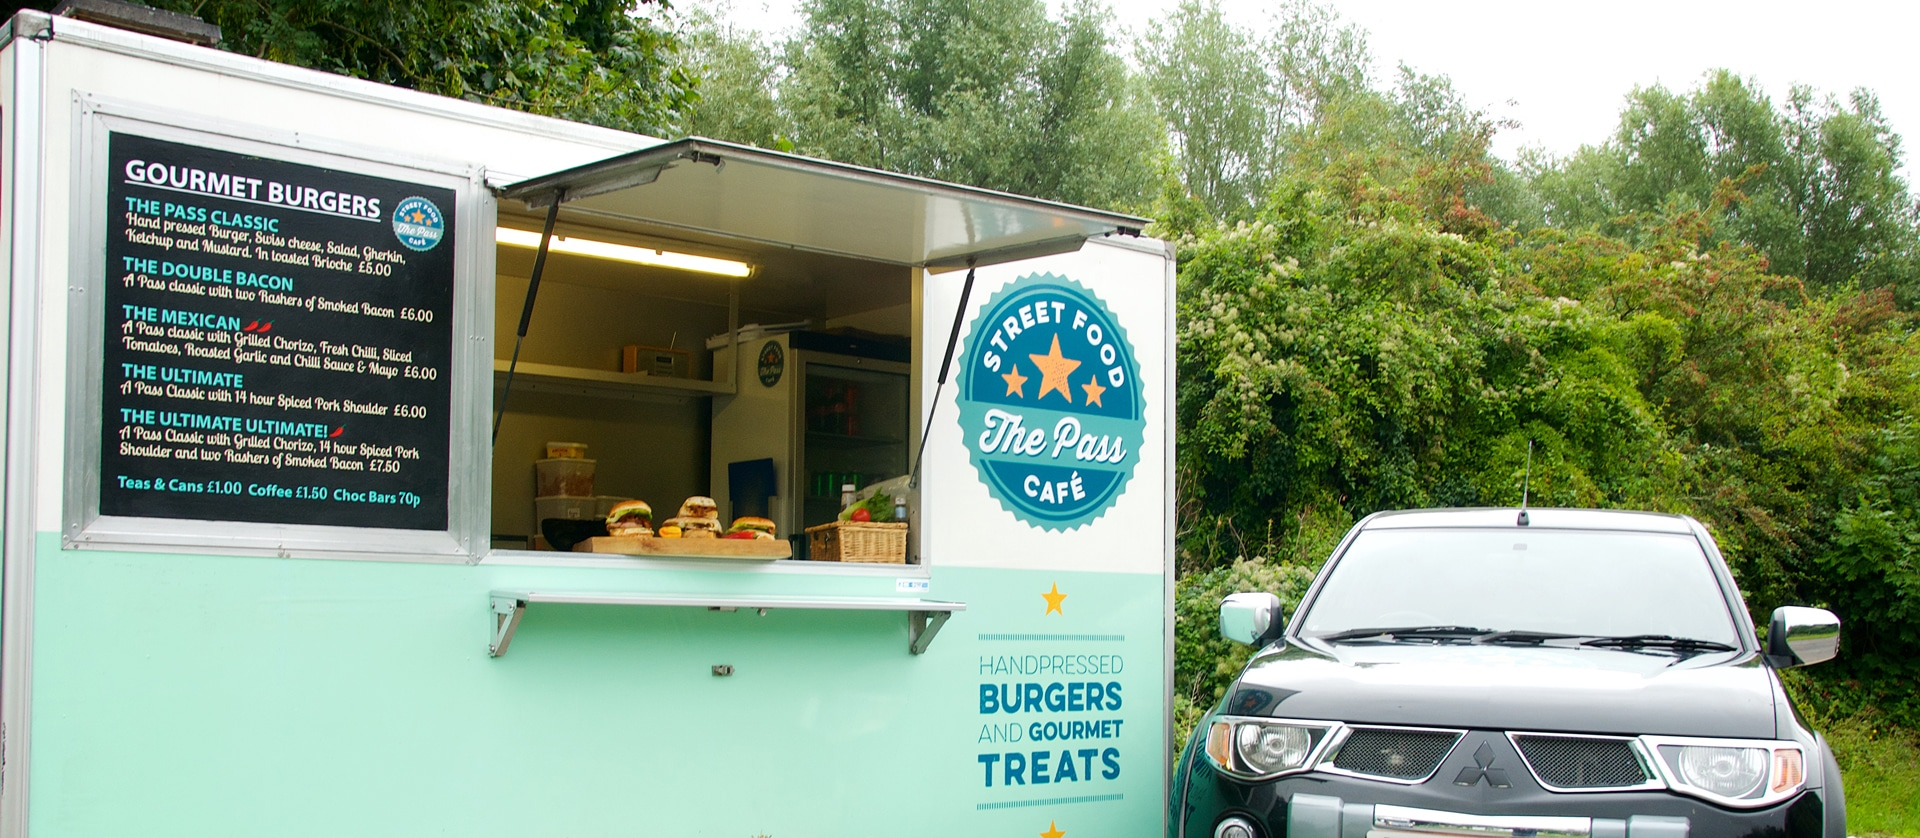 Food Trucks in Chichester